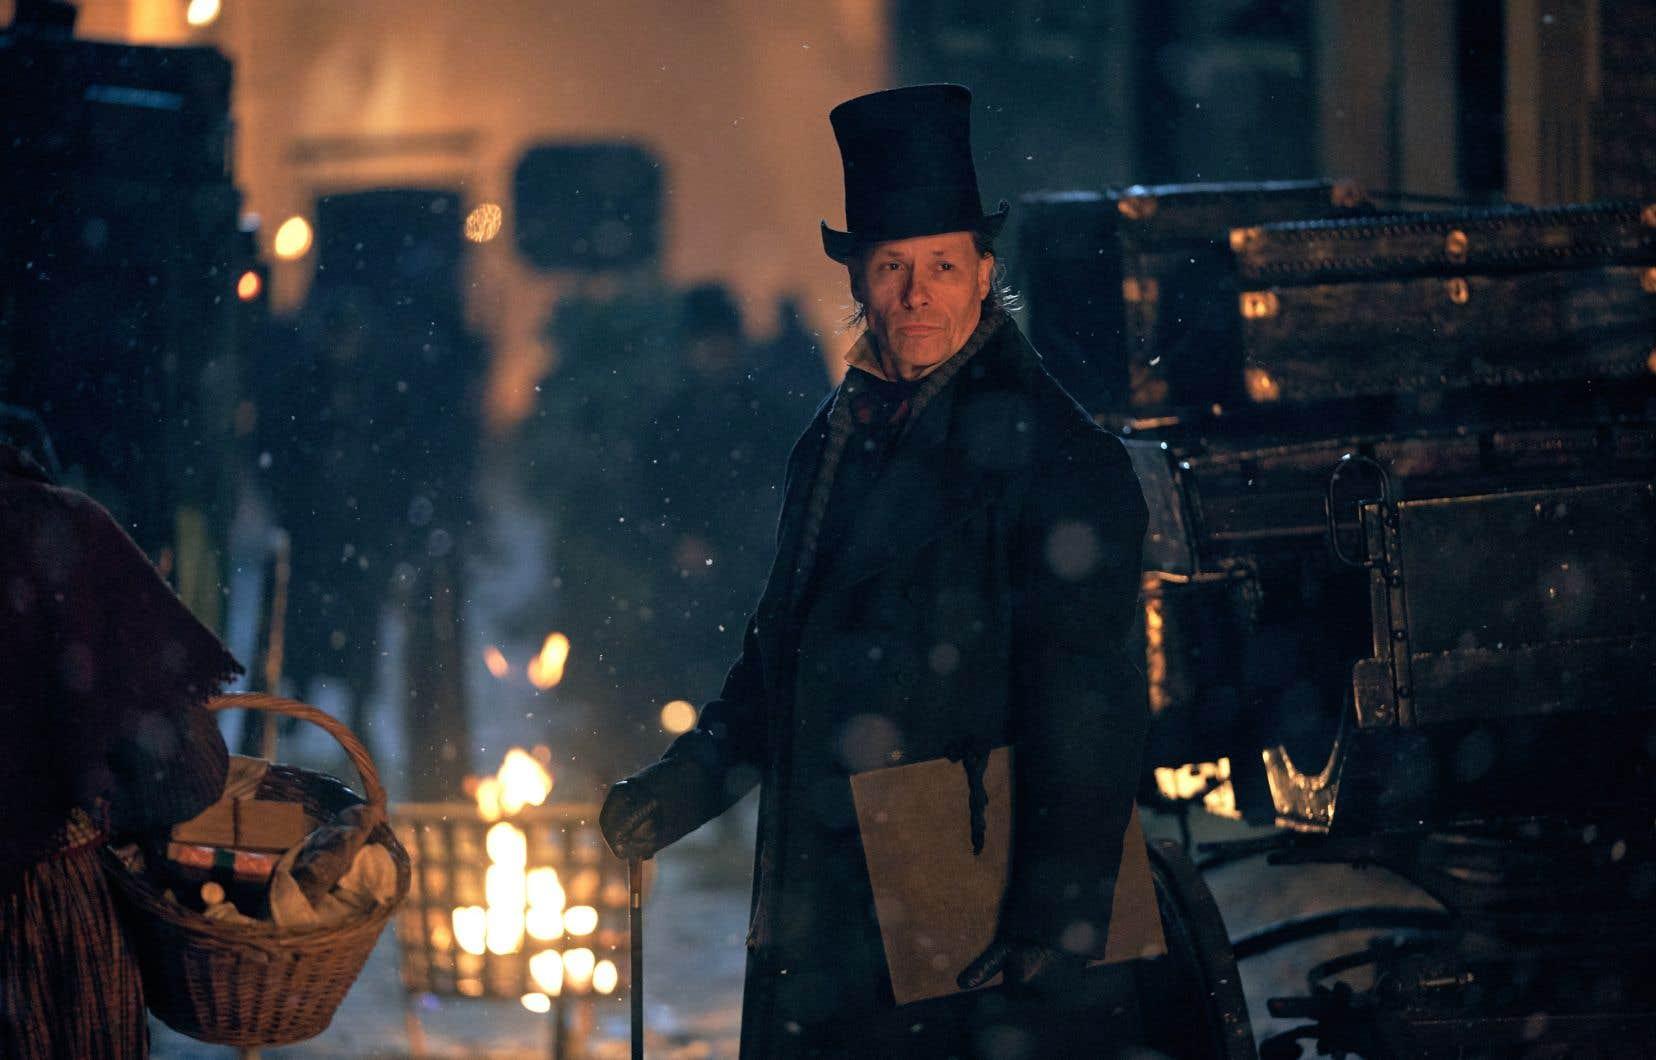 Le conte classique de Charles Dickens «A Christmas Carol»